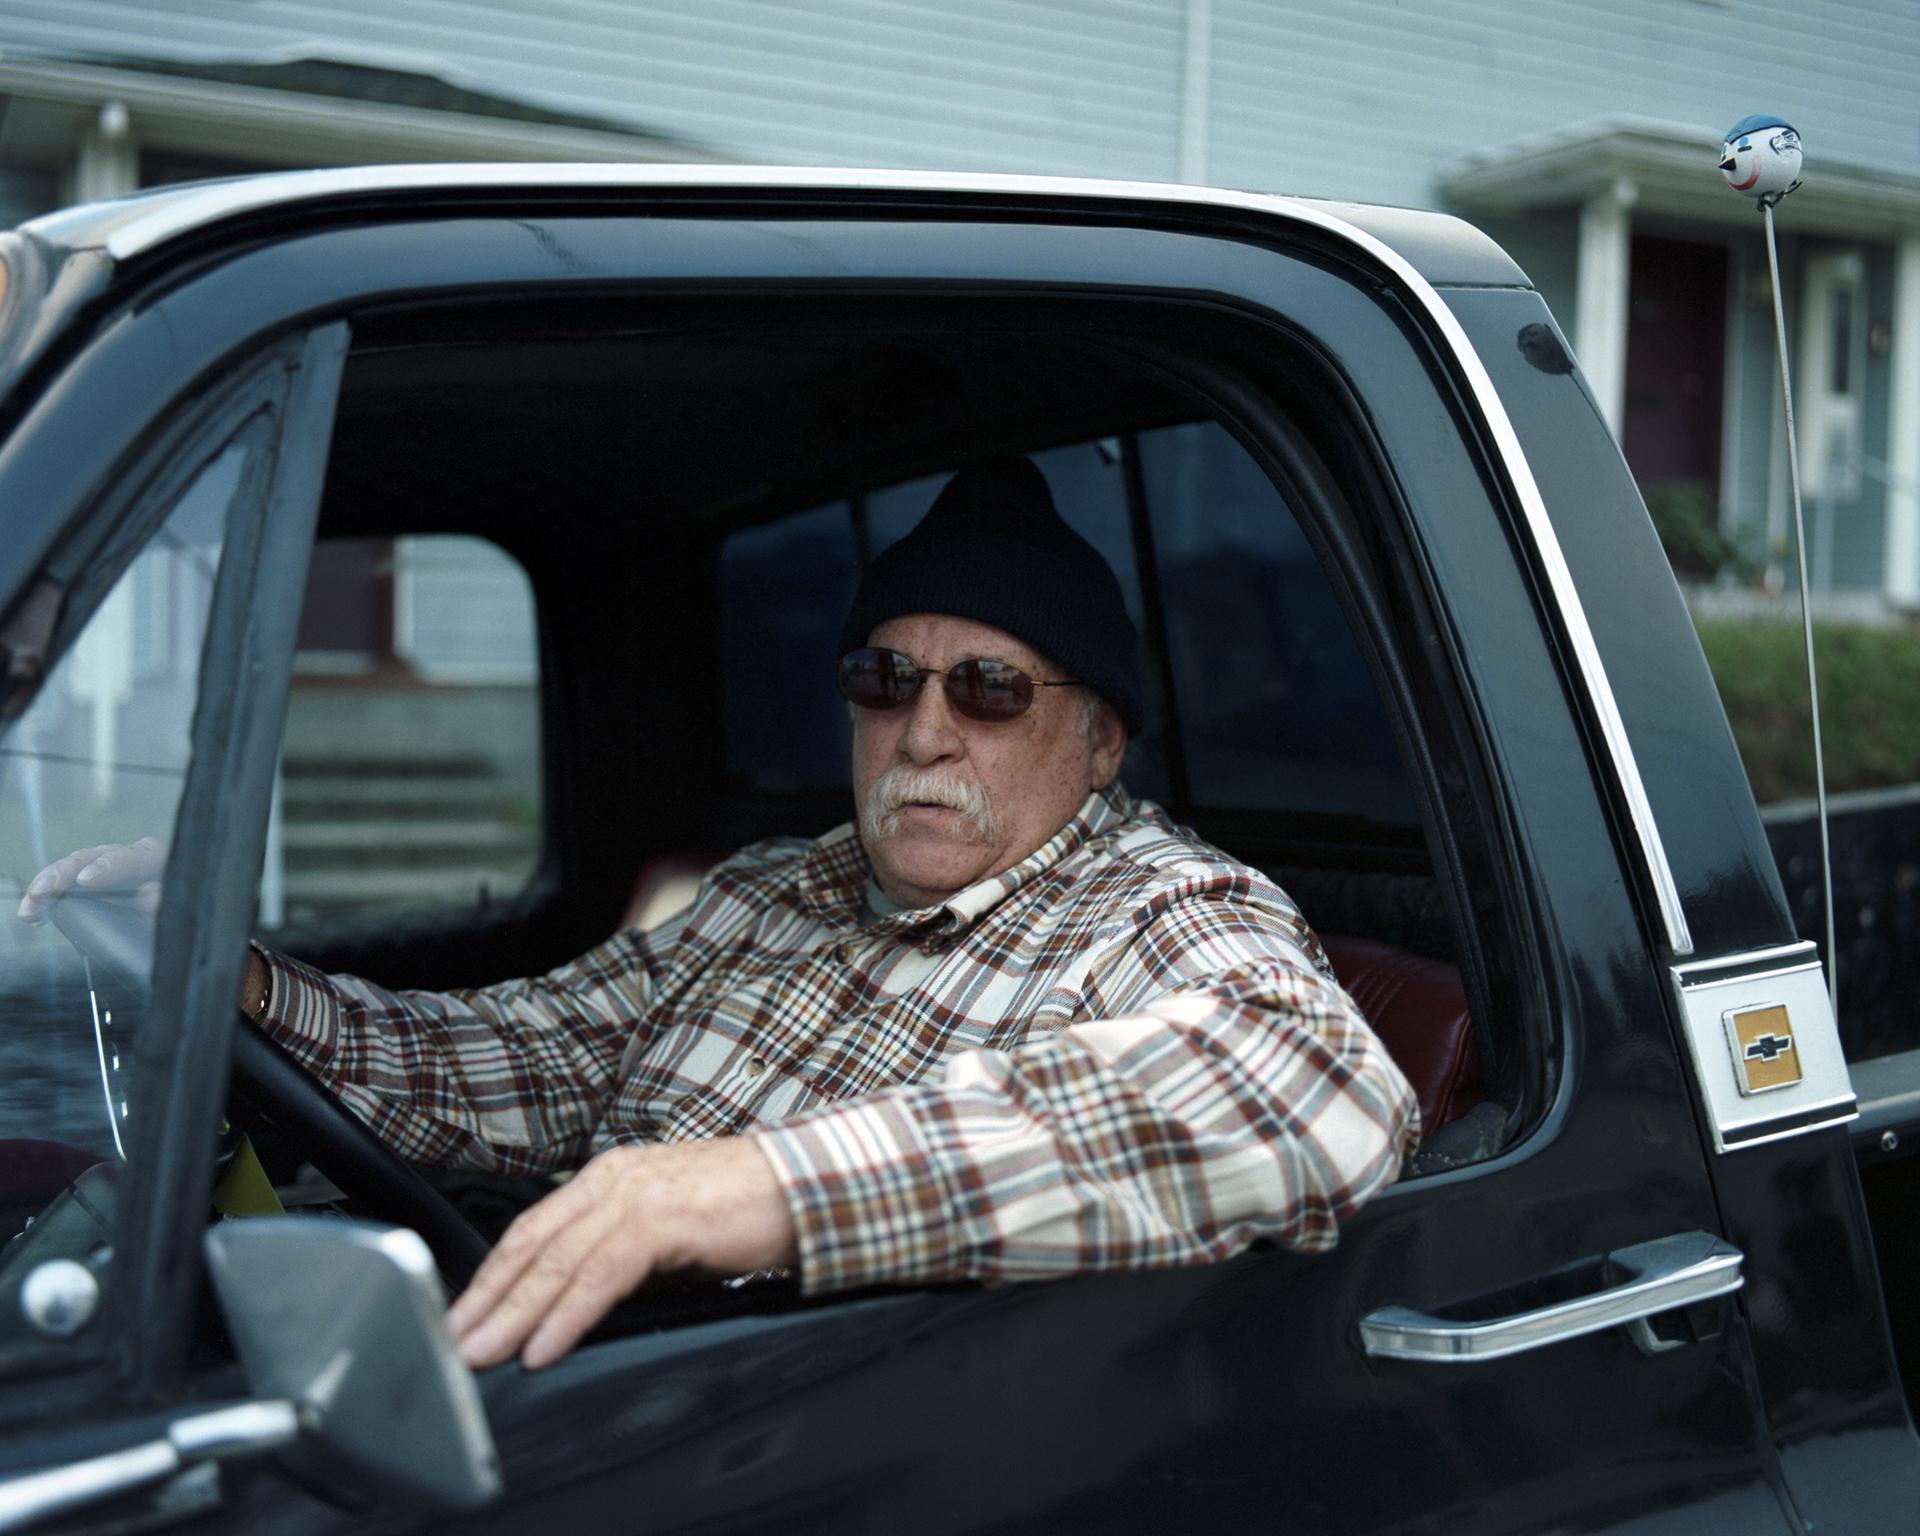 john in truck.jpg